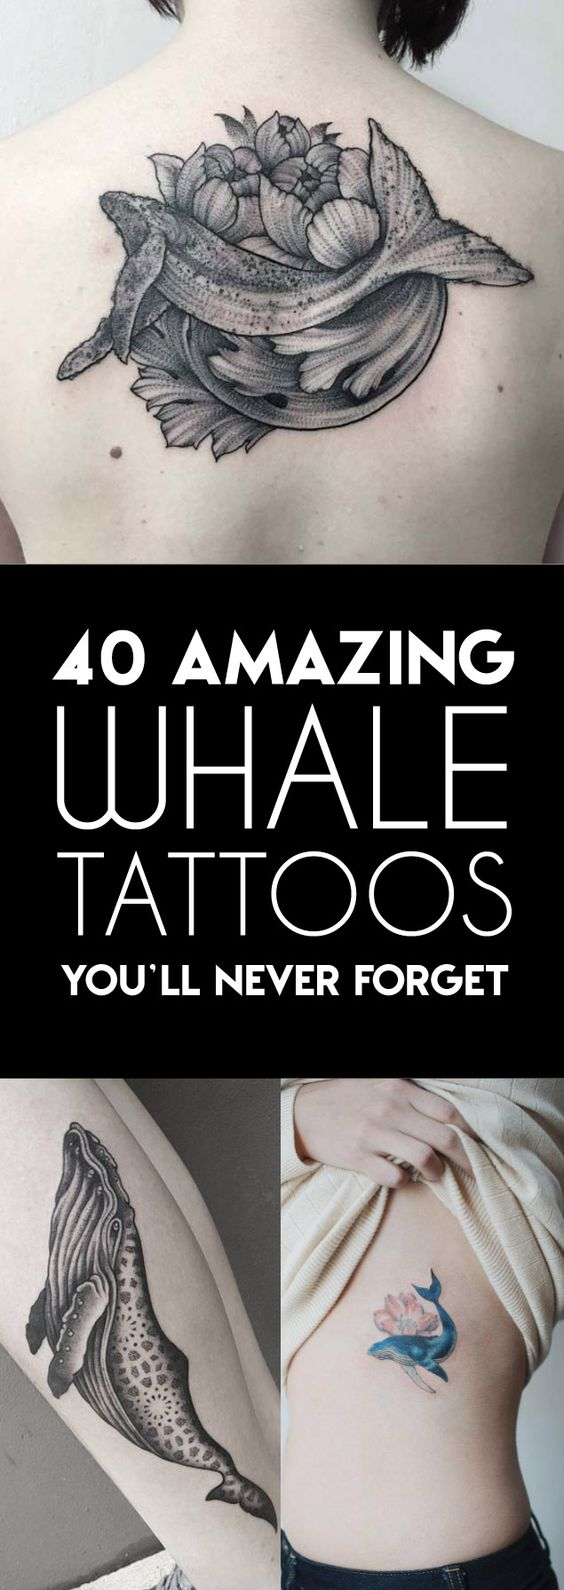 40 Amazing Whale Tattoos | TattooBlend